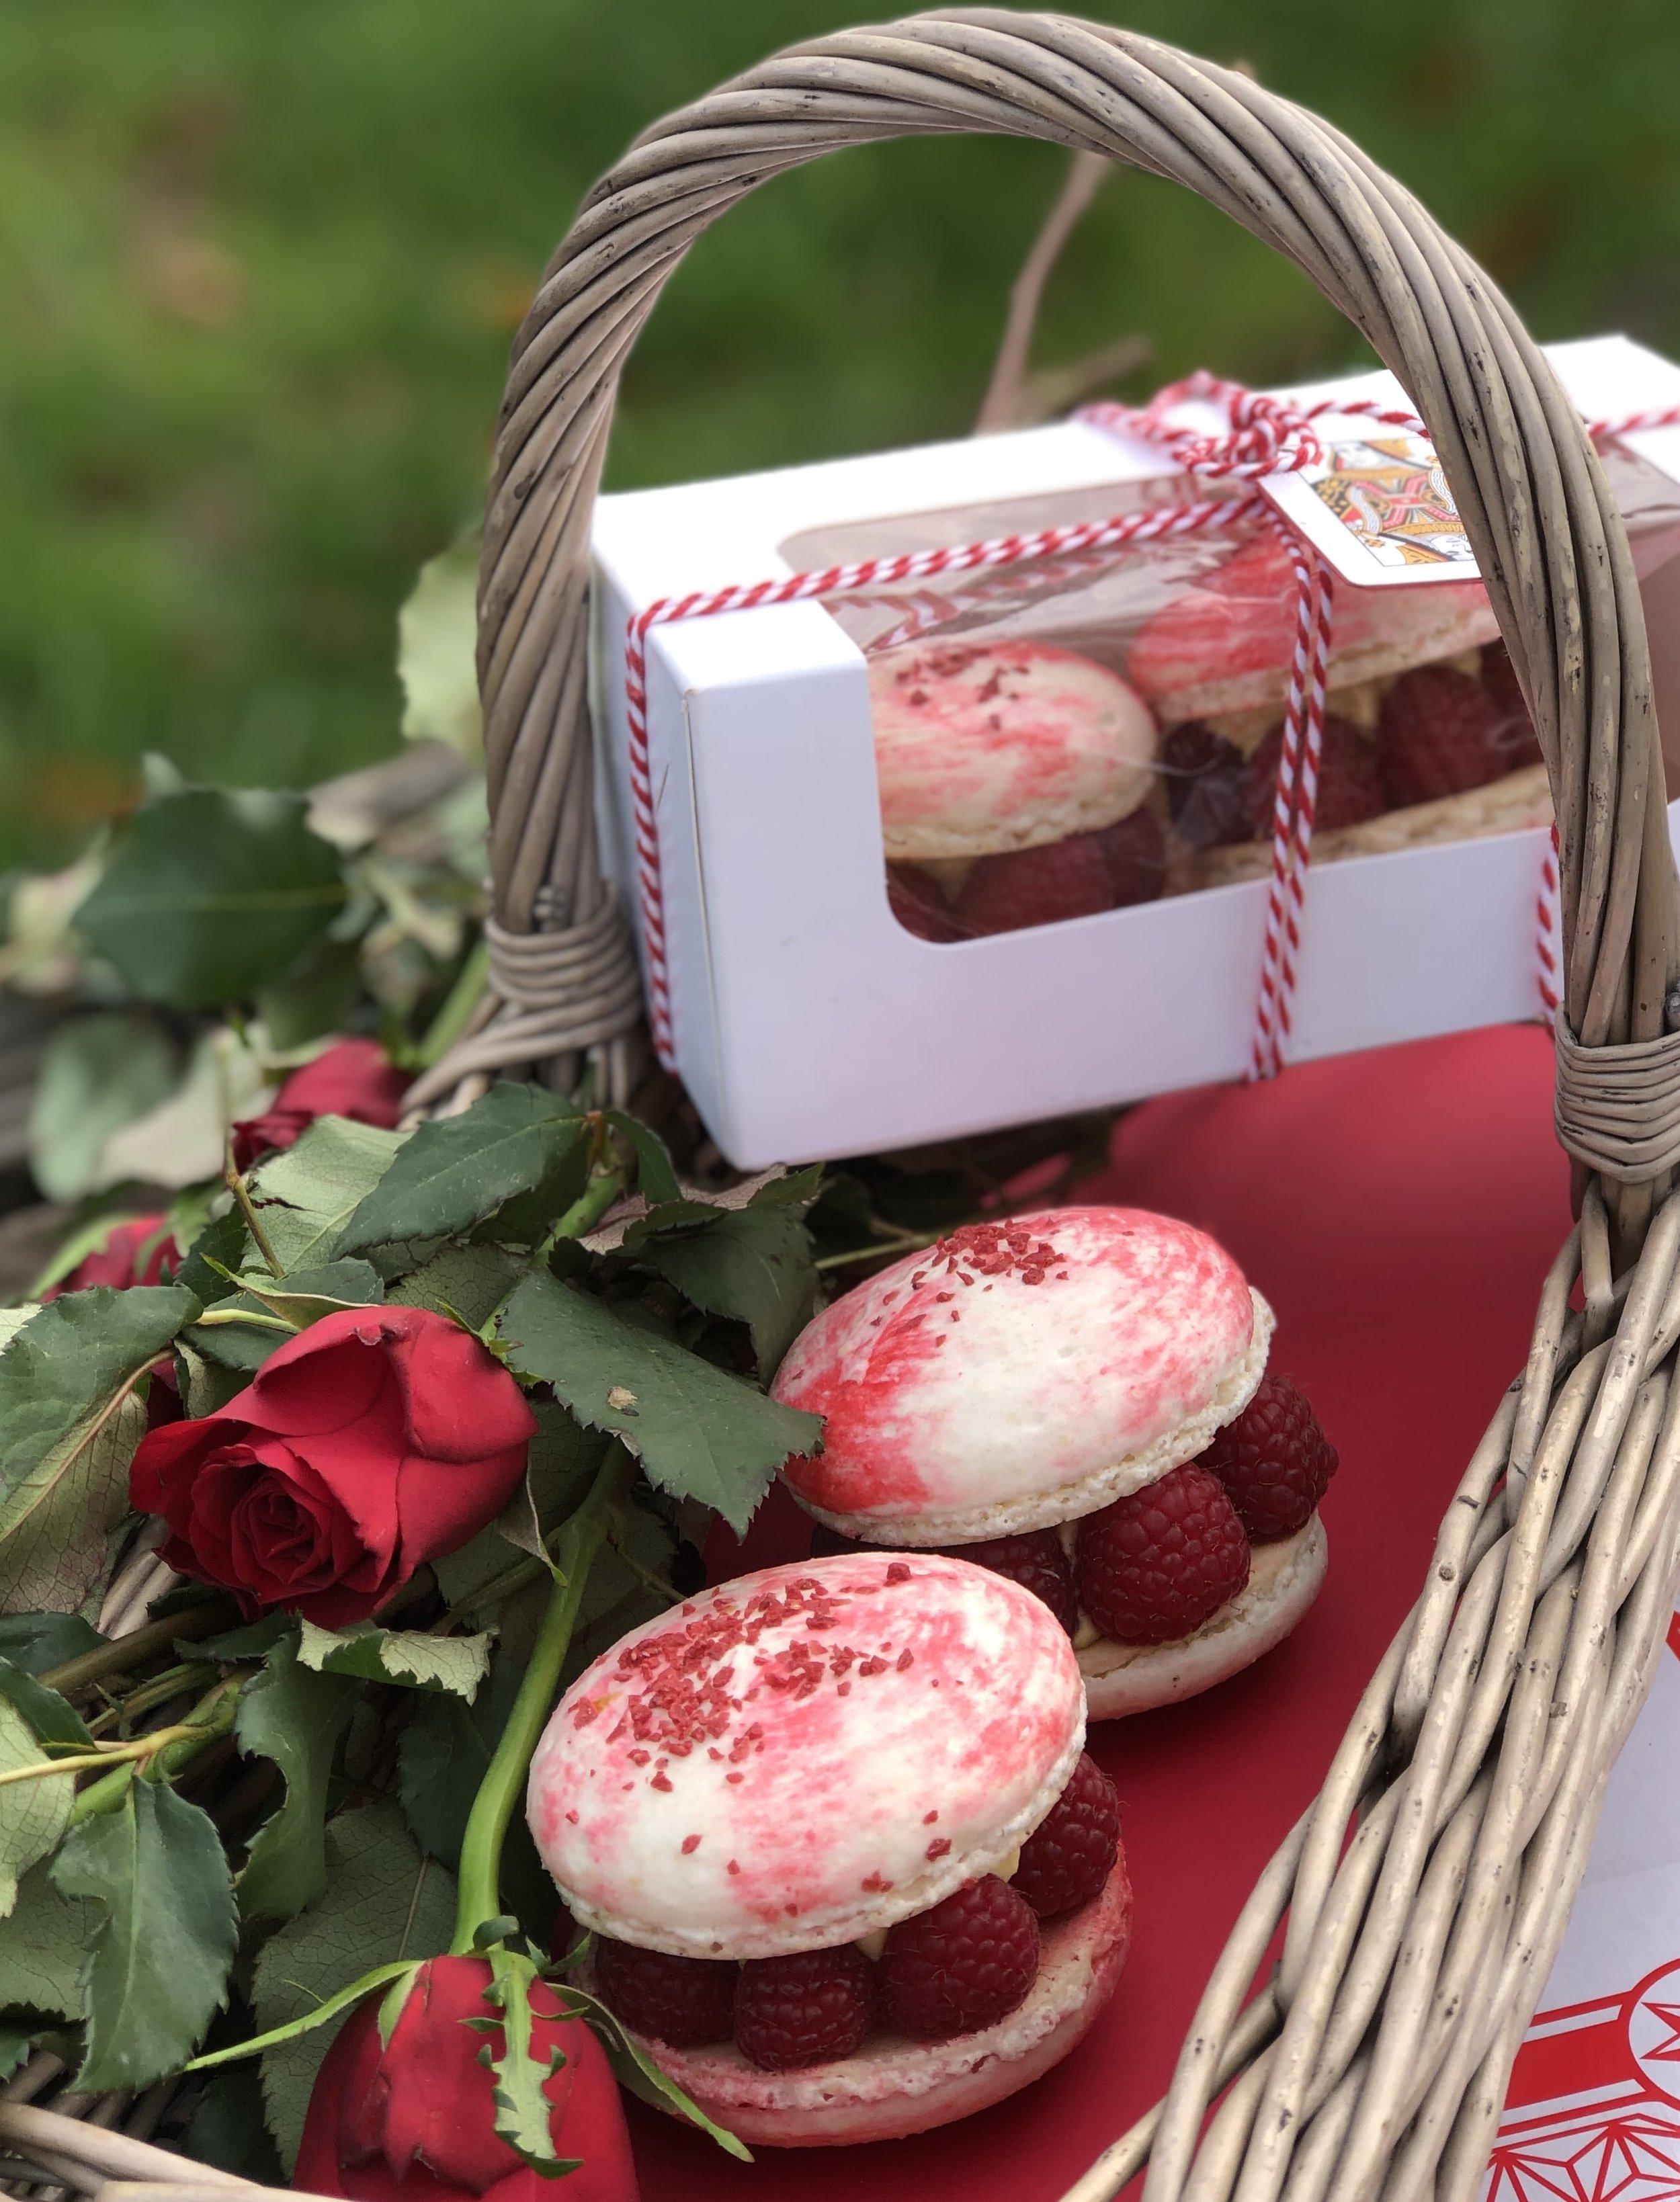 Hambleton_bakery_valentines_macaron.jpeg